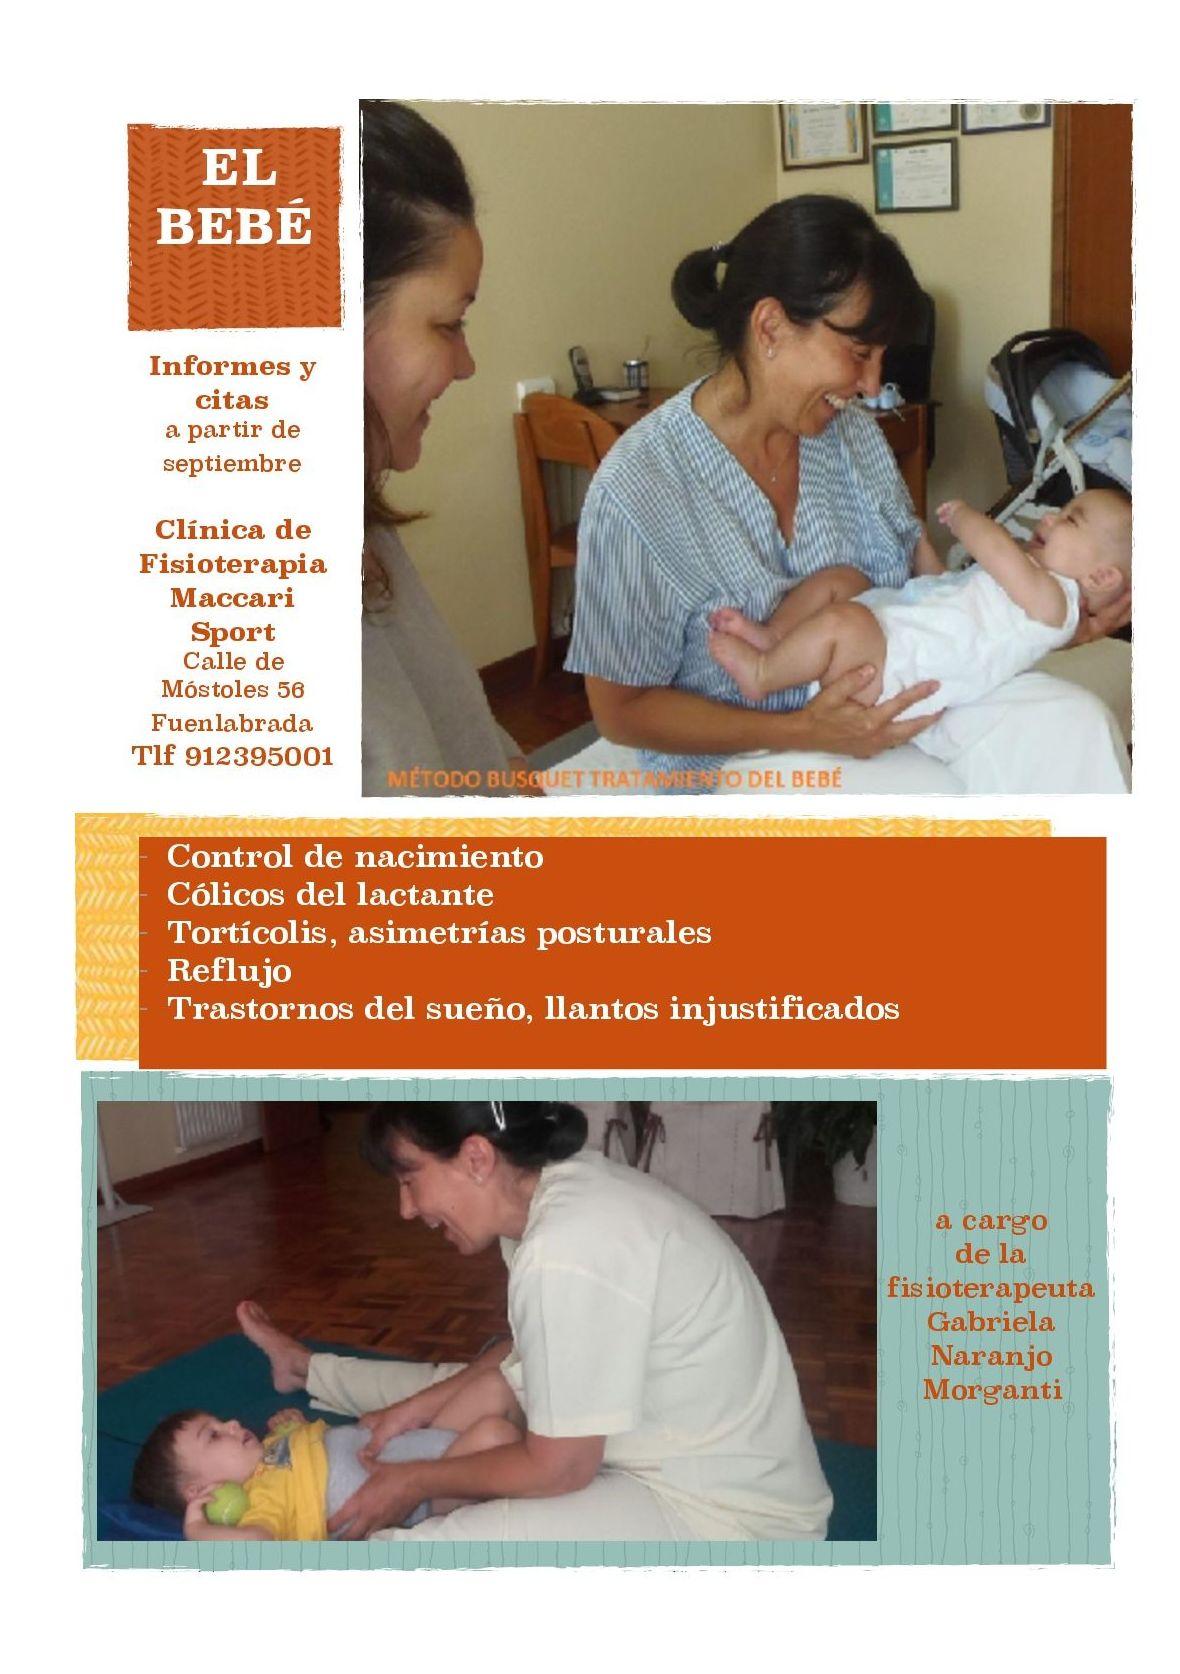 Foto 12 de Fisioterapia en Fuenlabrada | Clínica Fisioterapia Maccari Sport